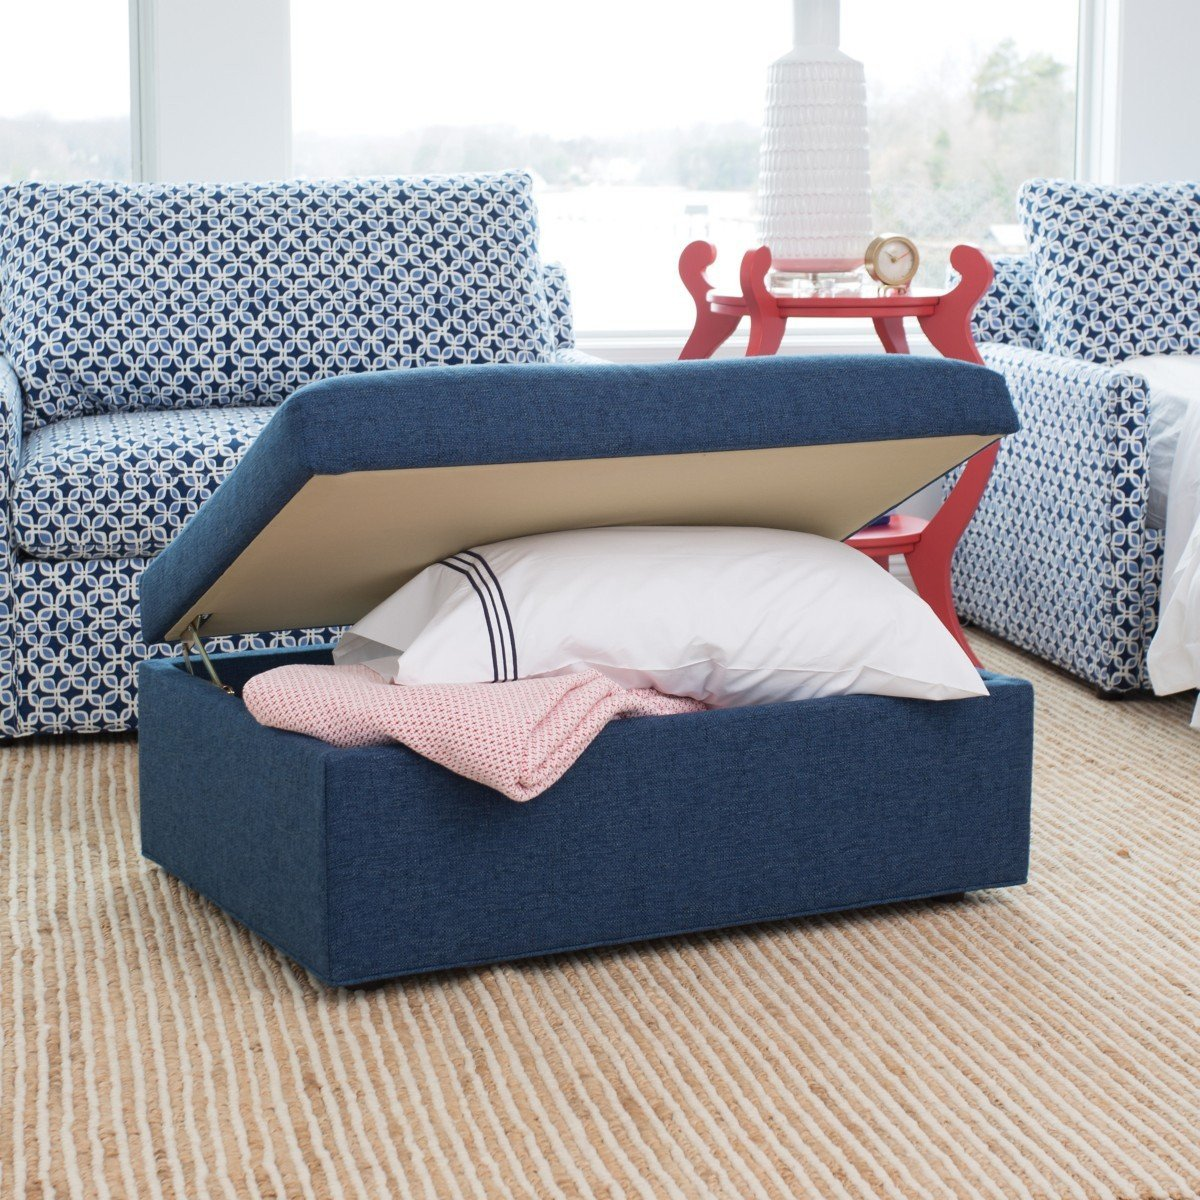 Bedroom Storage Bench Seat Elegant Milly Storage Ottoman